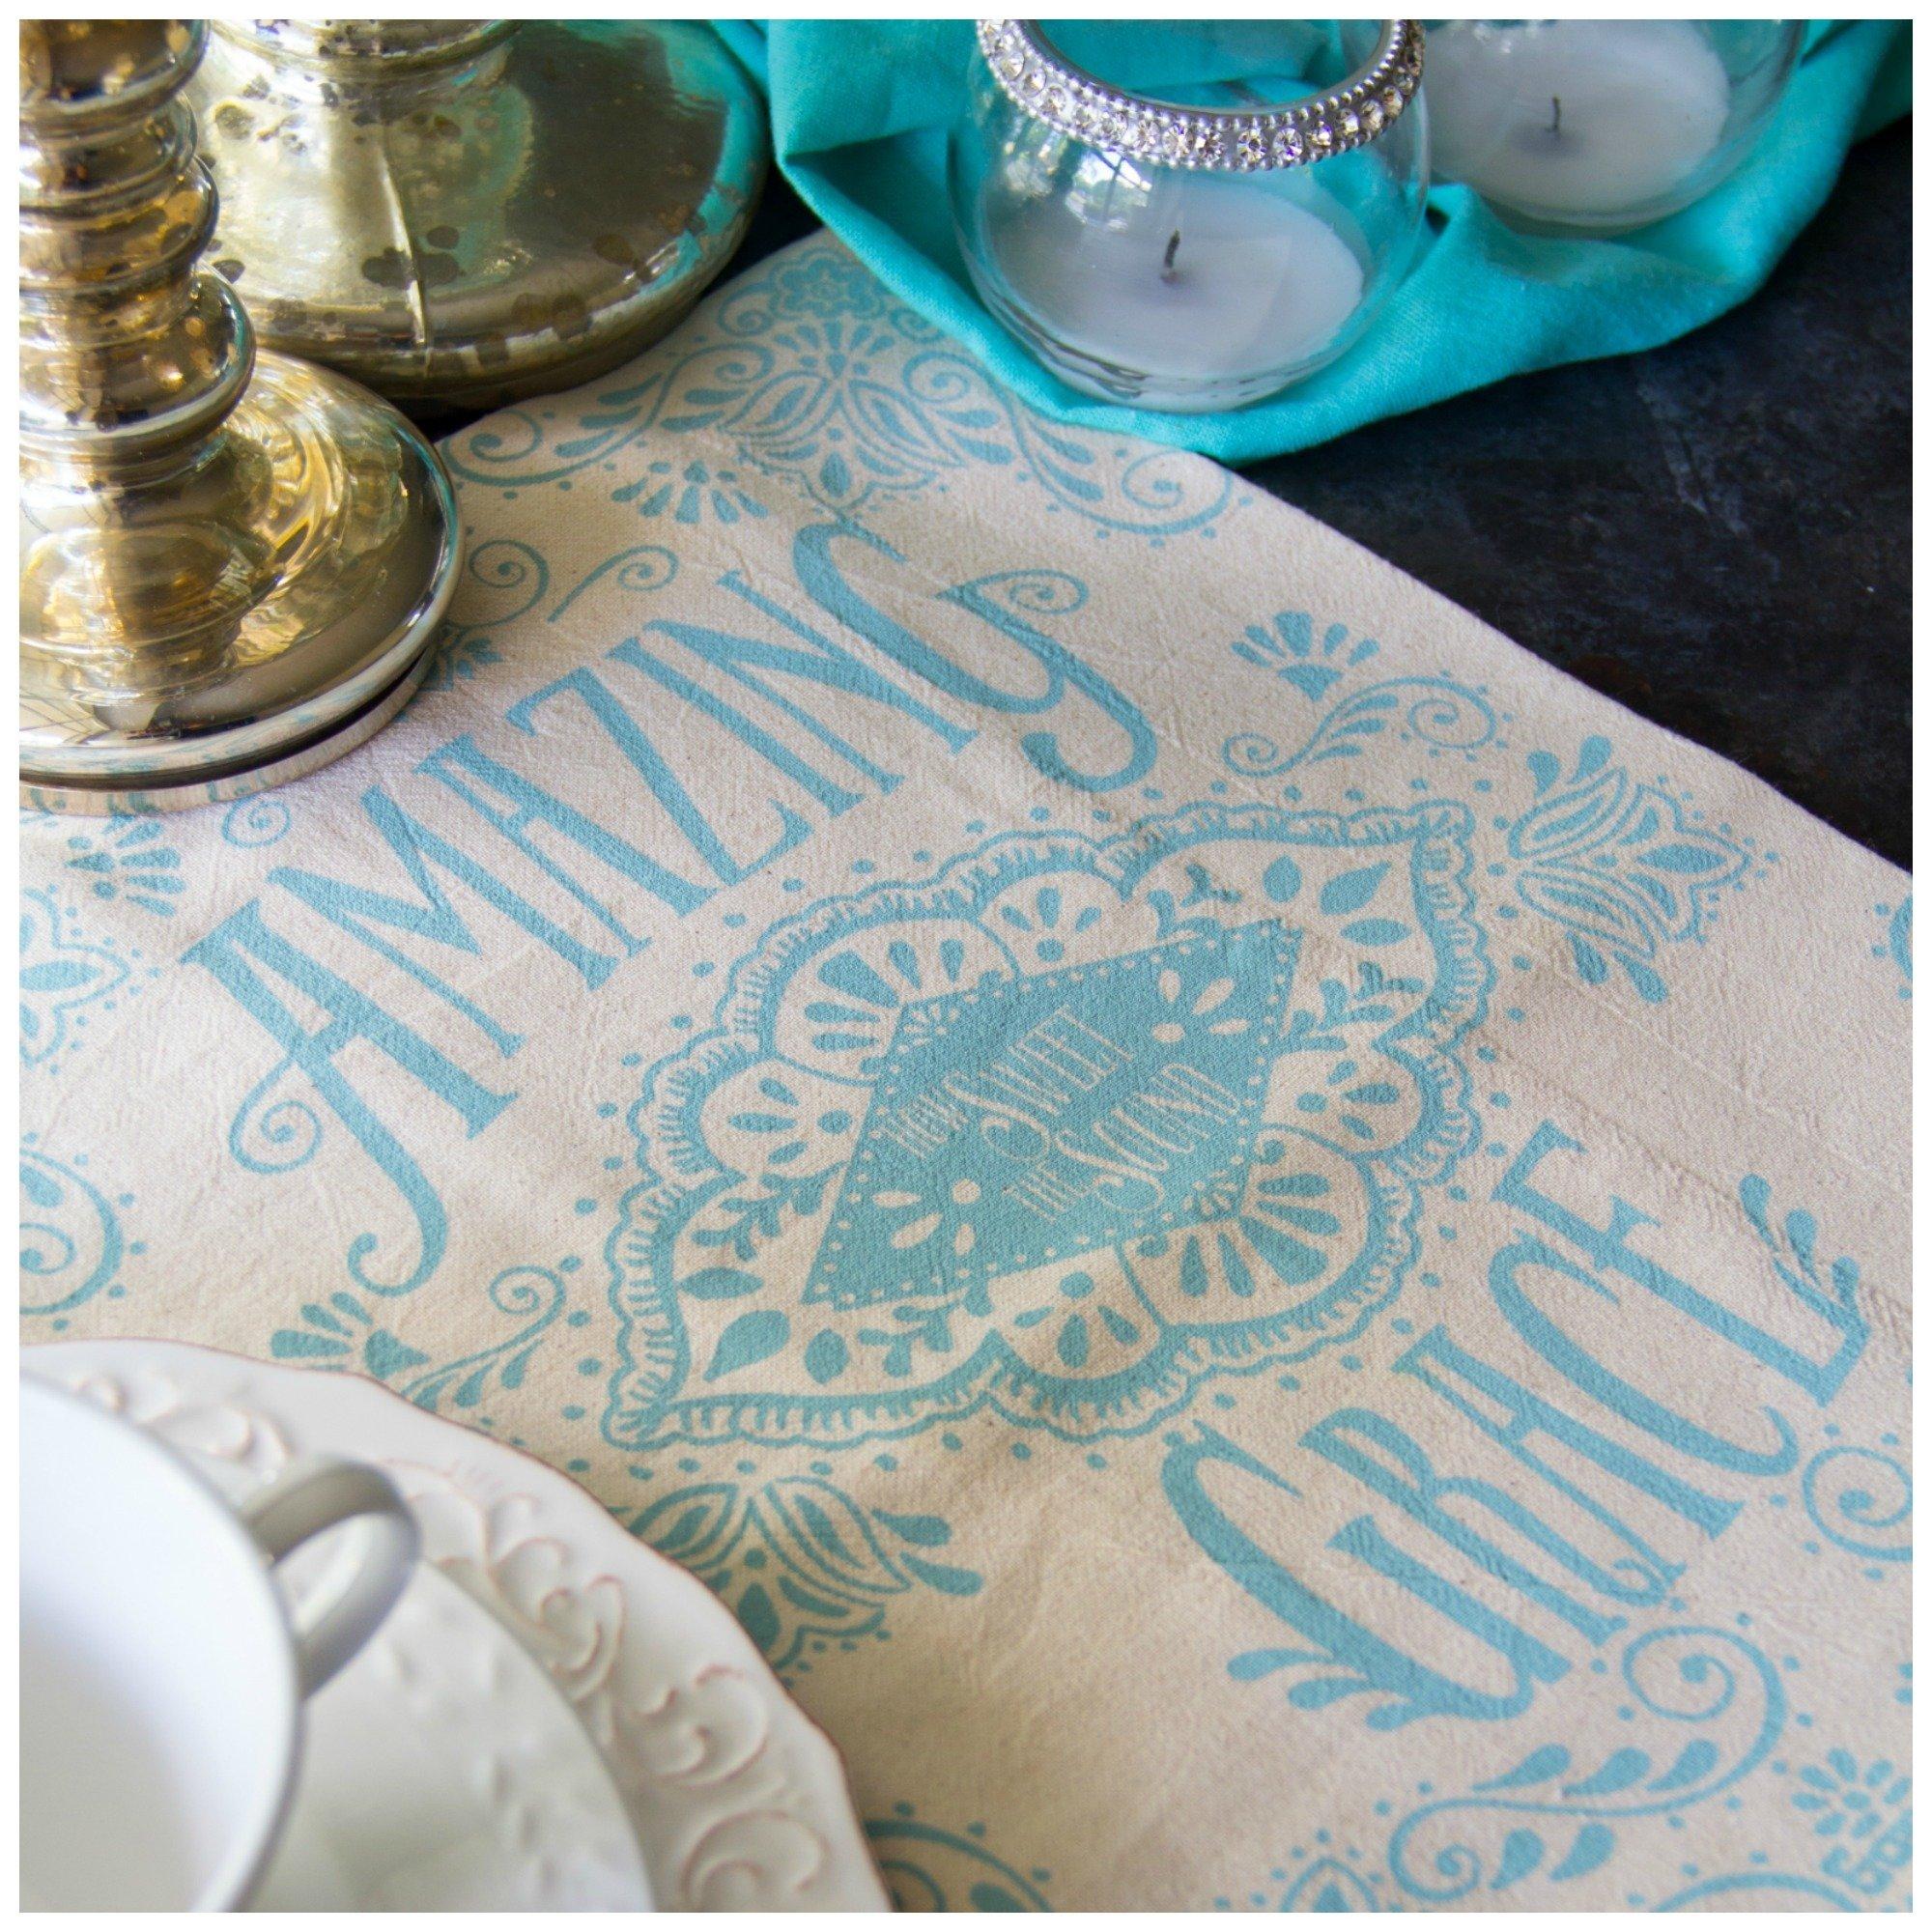 Amazing Grace Hymn Flour Sack Tea Towel 00002